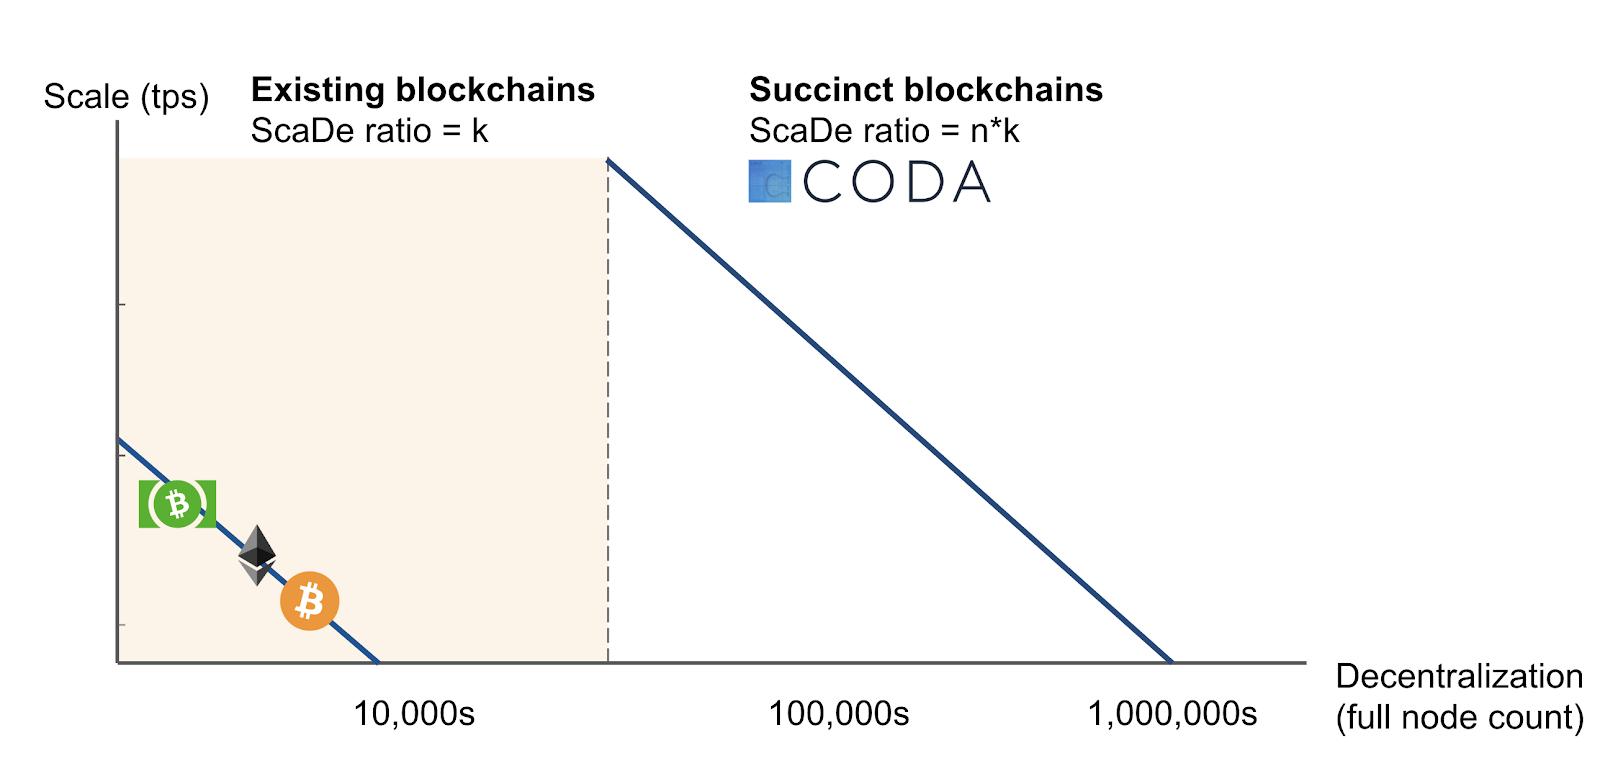 Coda on the ScaDe Chart